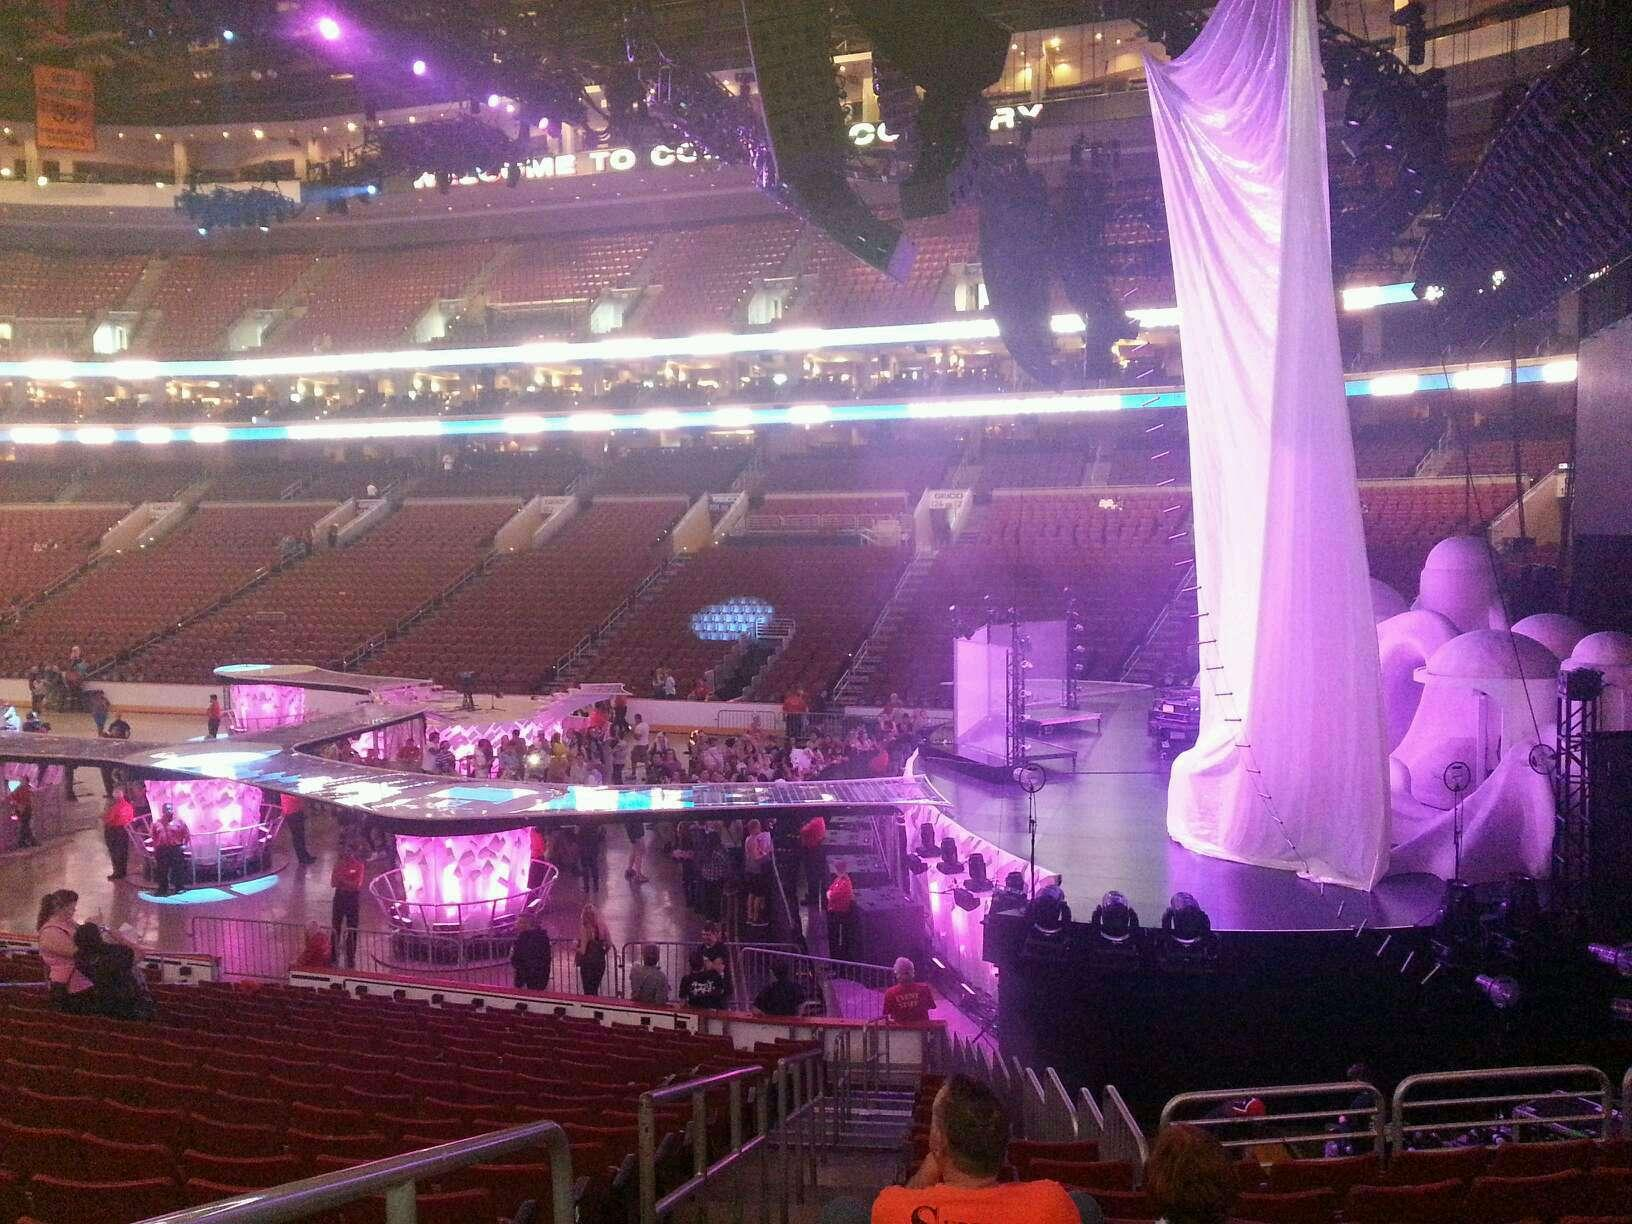 Wells Fargo Center Section 116 Concert Seating